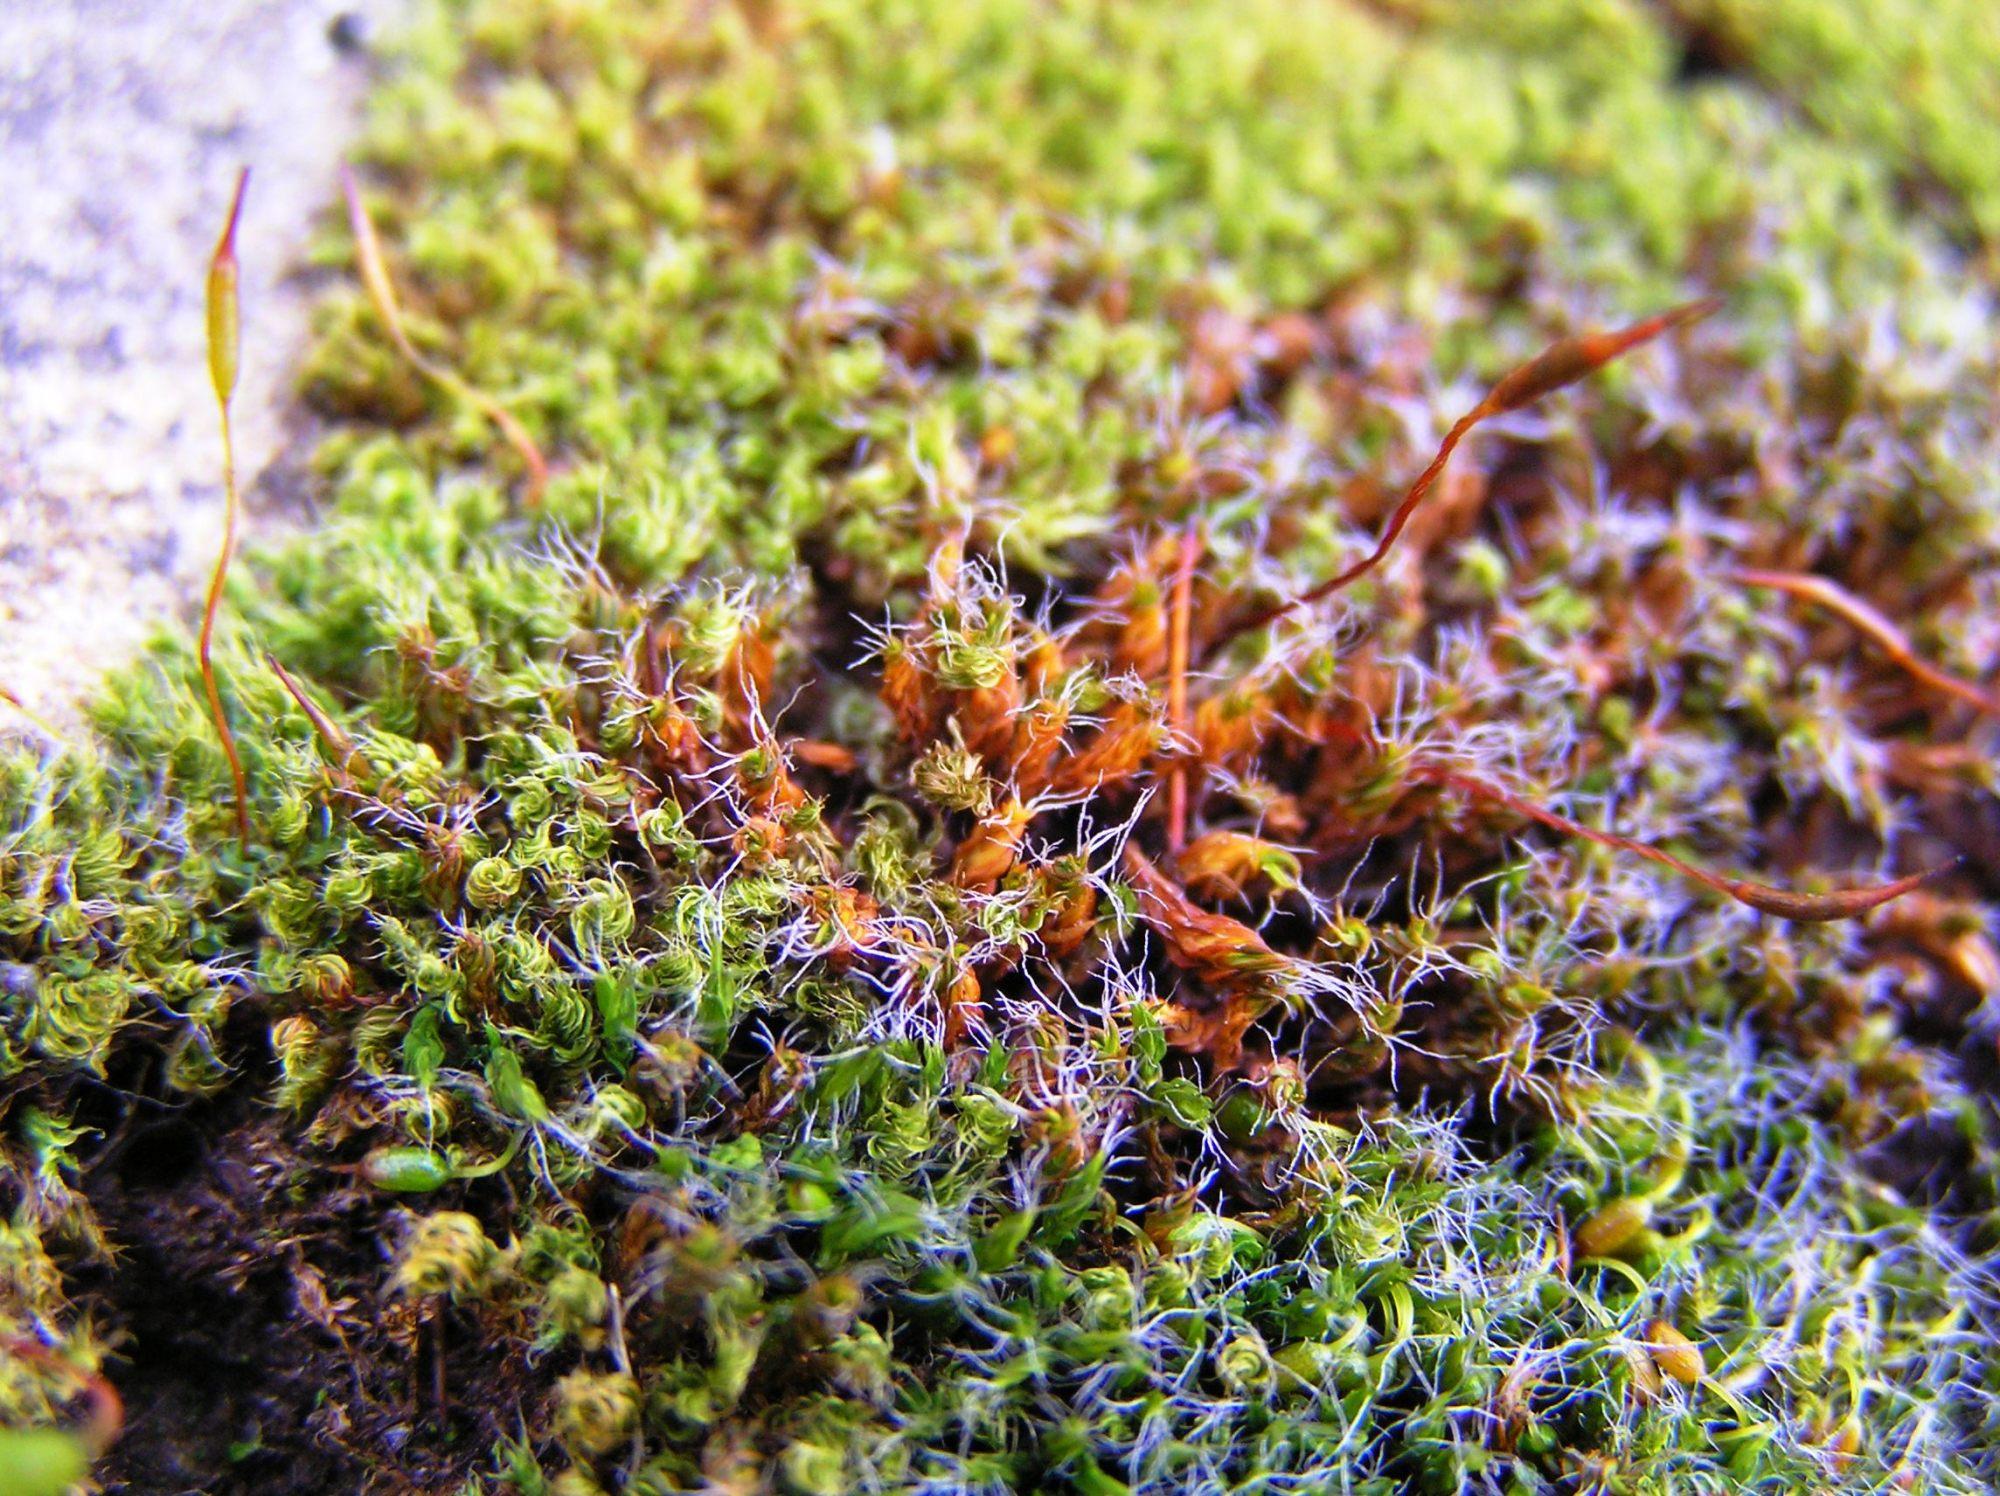 hight resolution of mosses